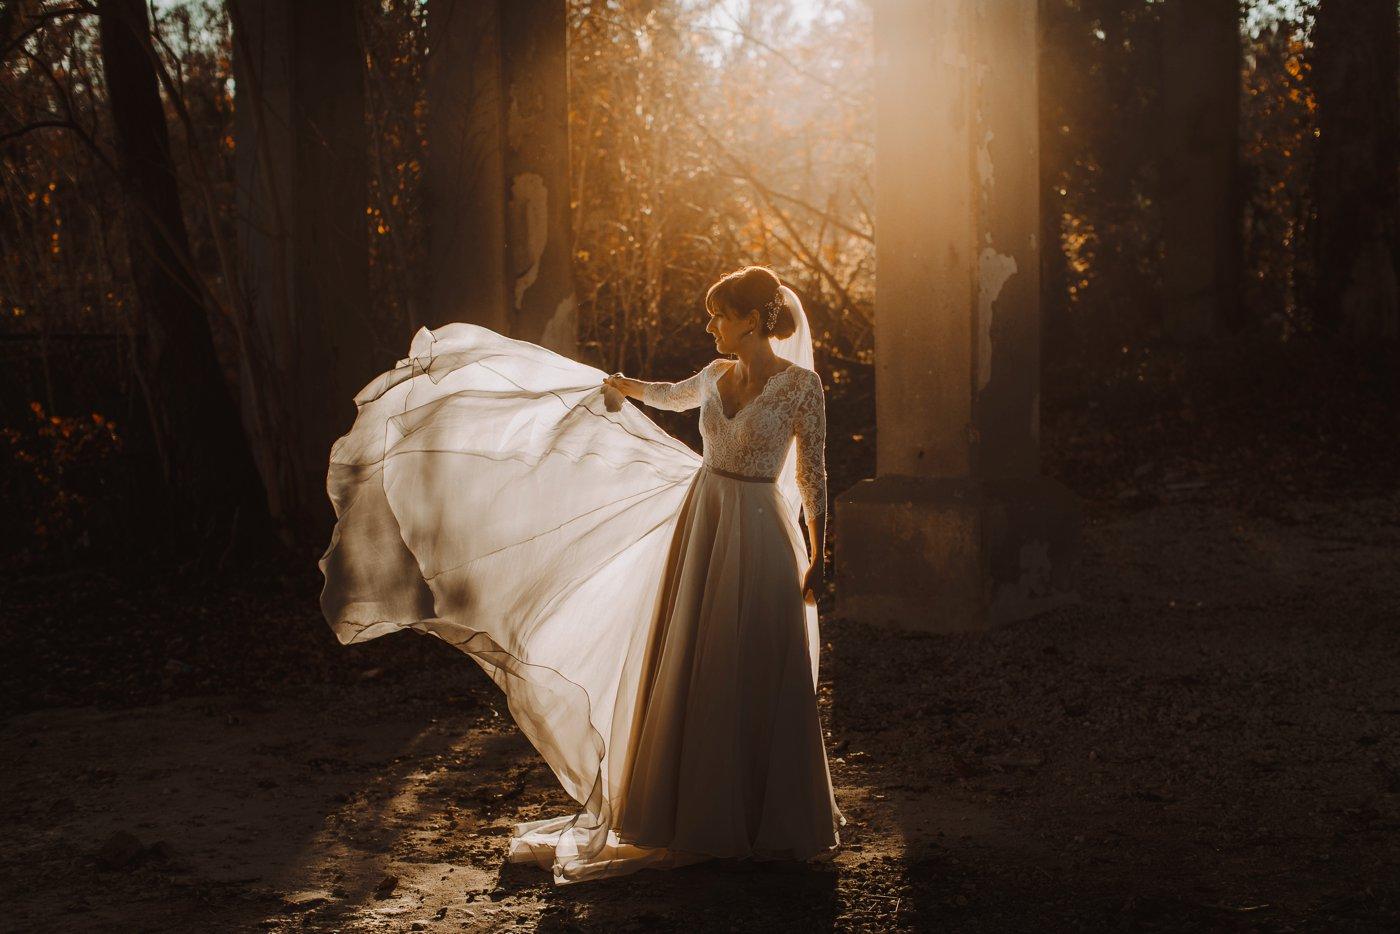 bridal gown golden hour silhouette dress flip Baltimore wedding photographer